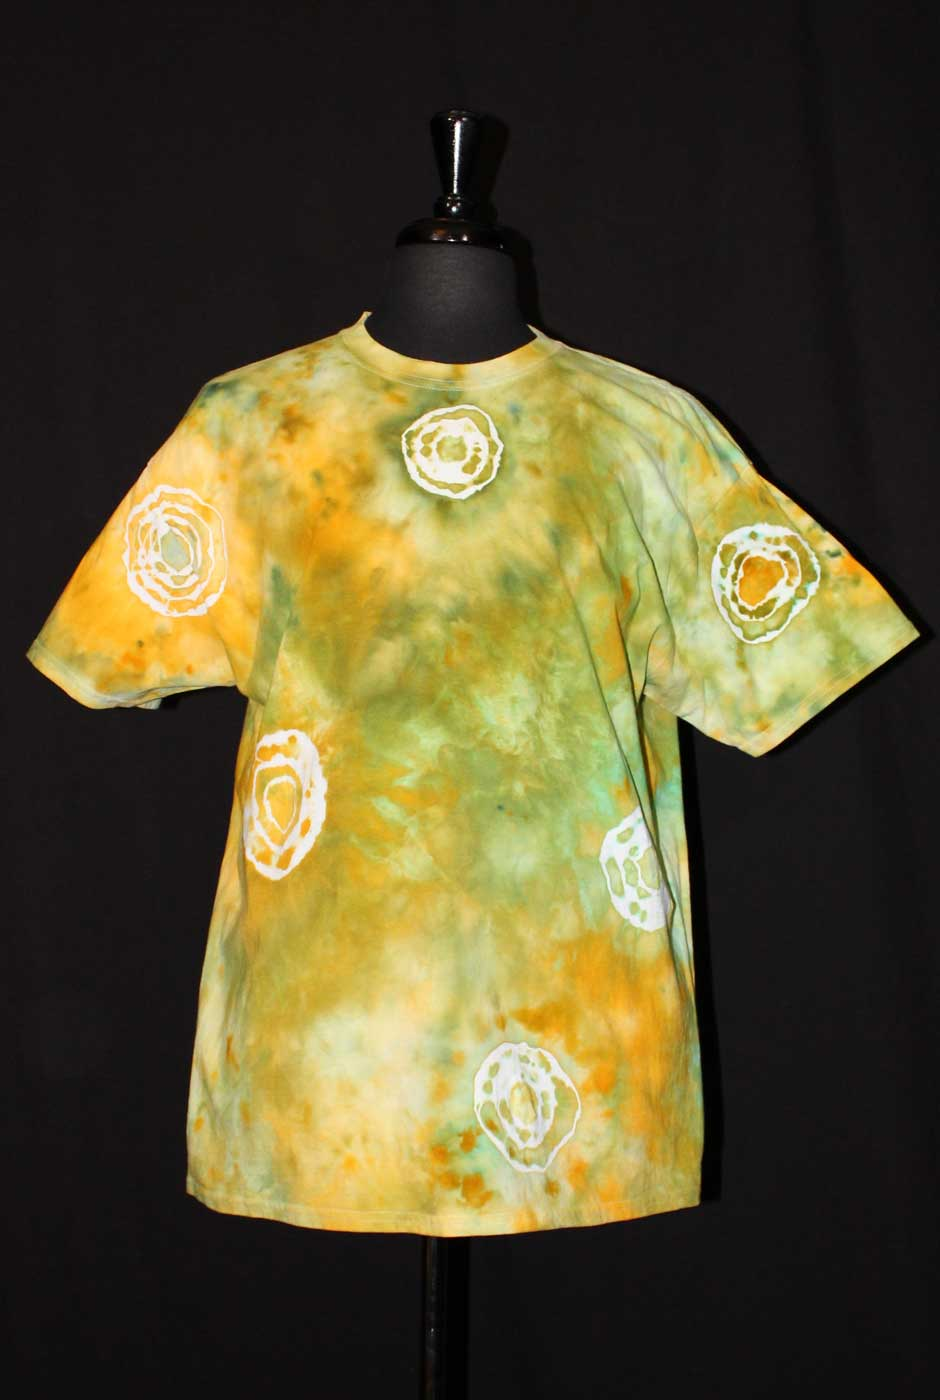 Prods Nostalgia Geode T Shirt Fp